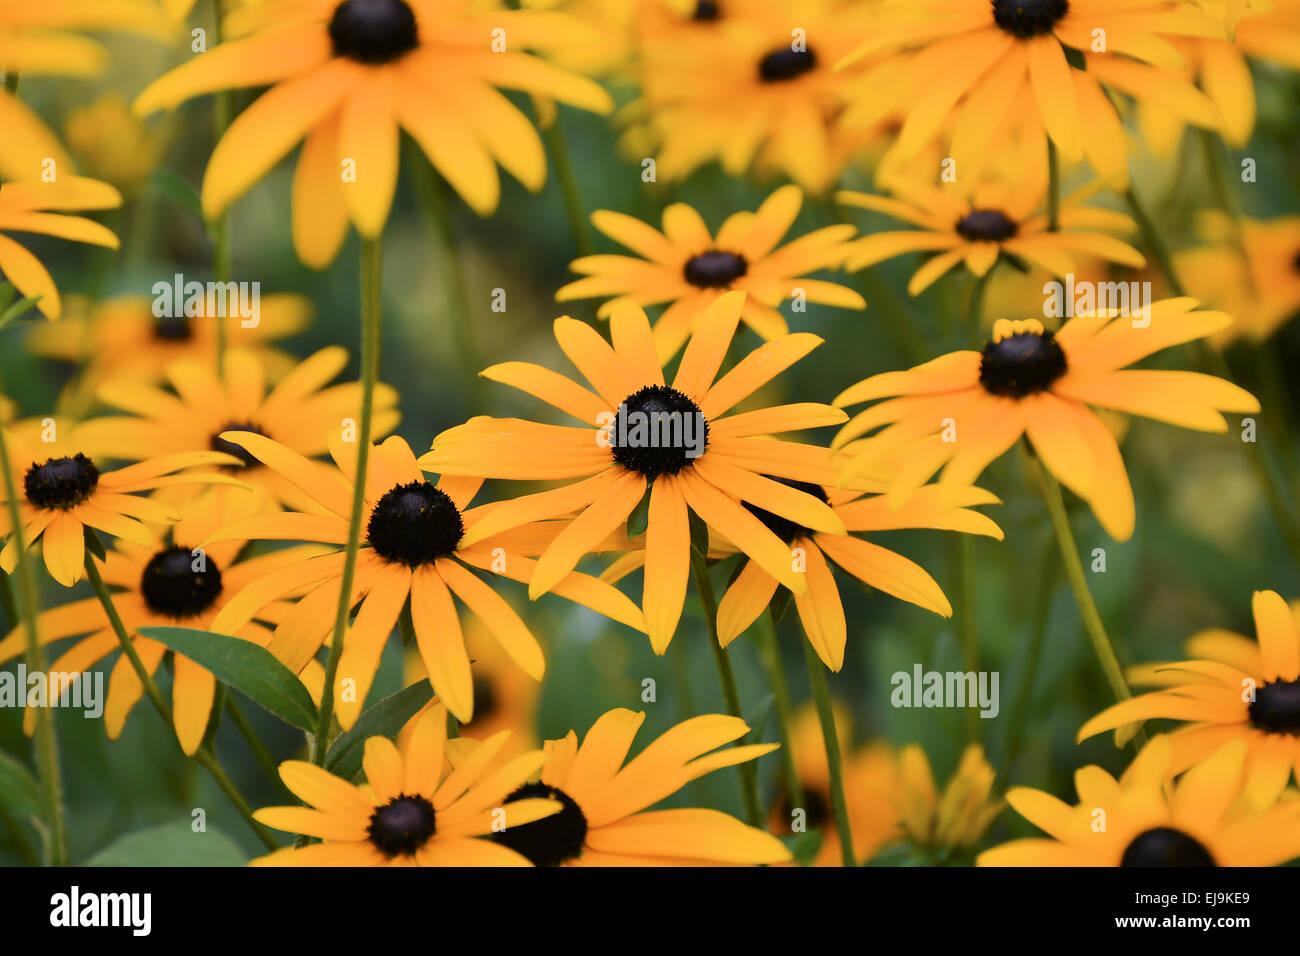 Summer flowers - Stock Image